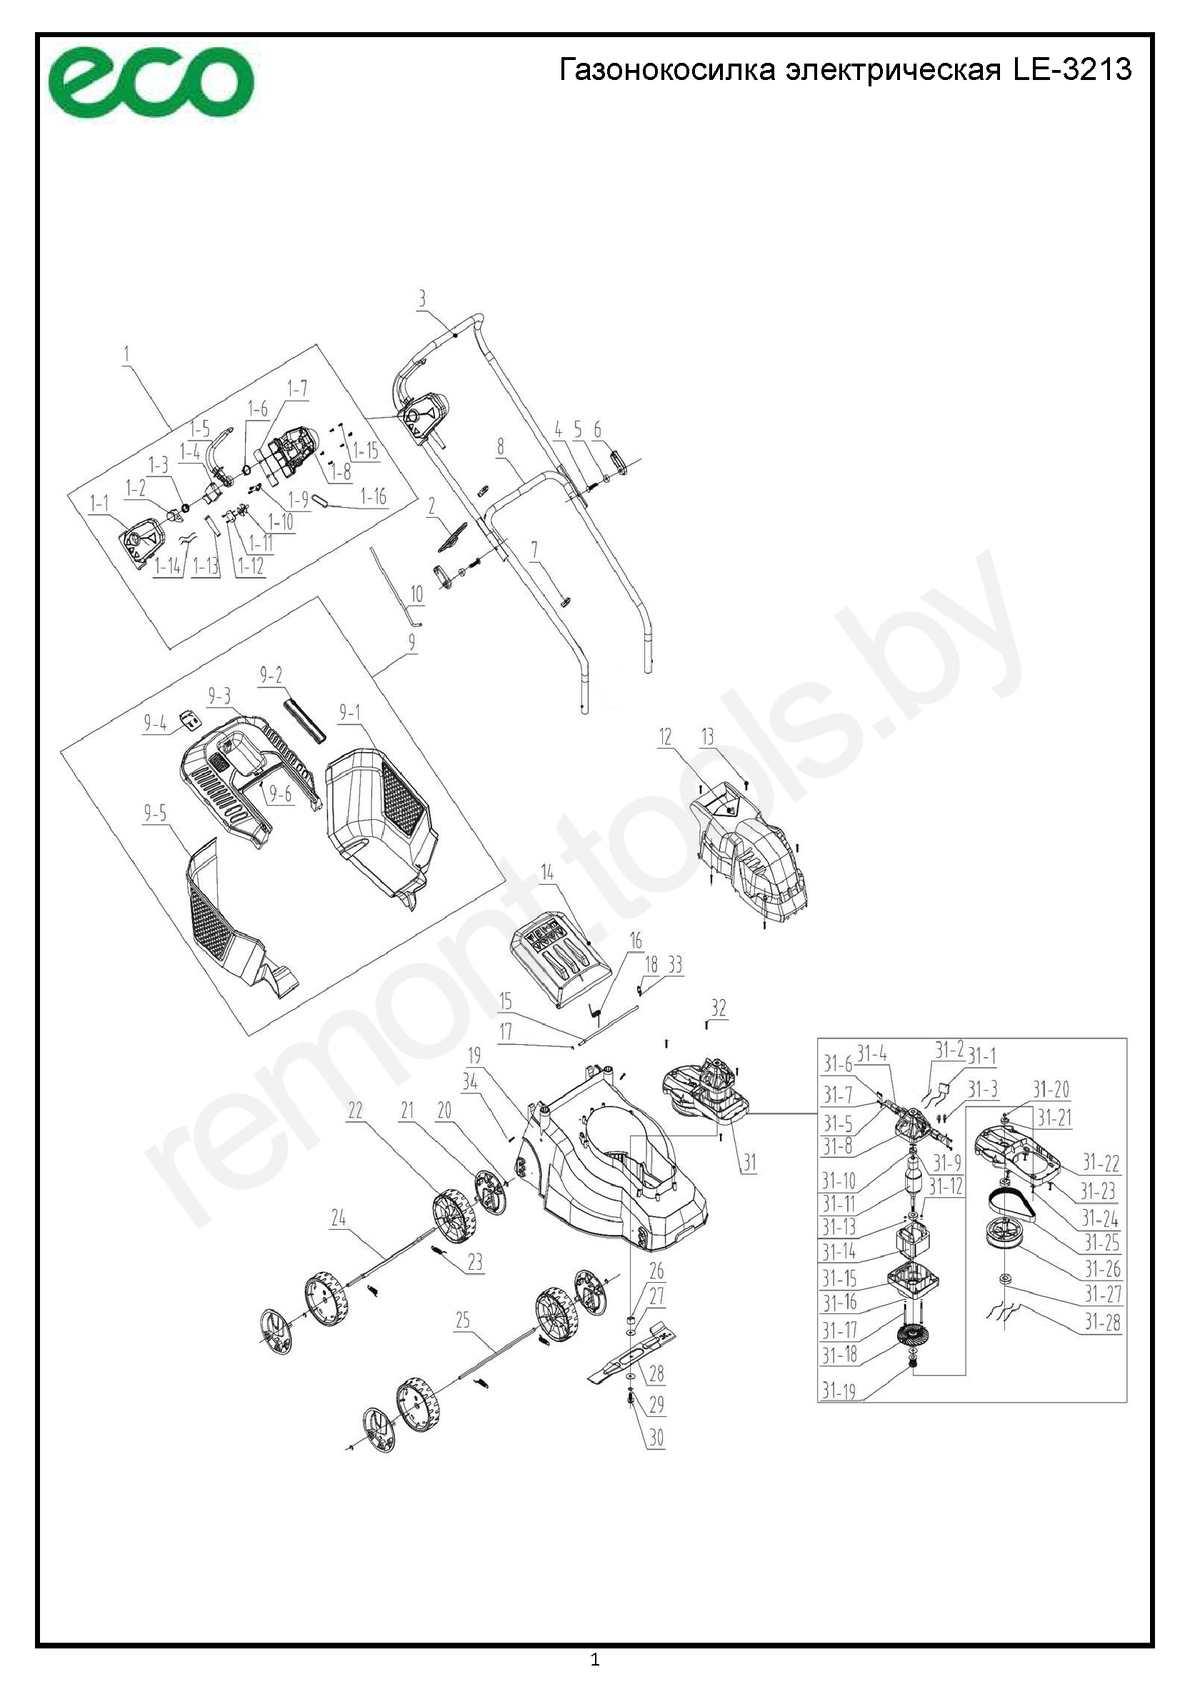 Eco Газонокосилка электрическая Le 3213